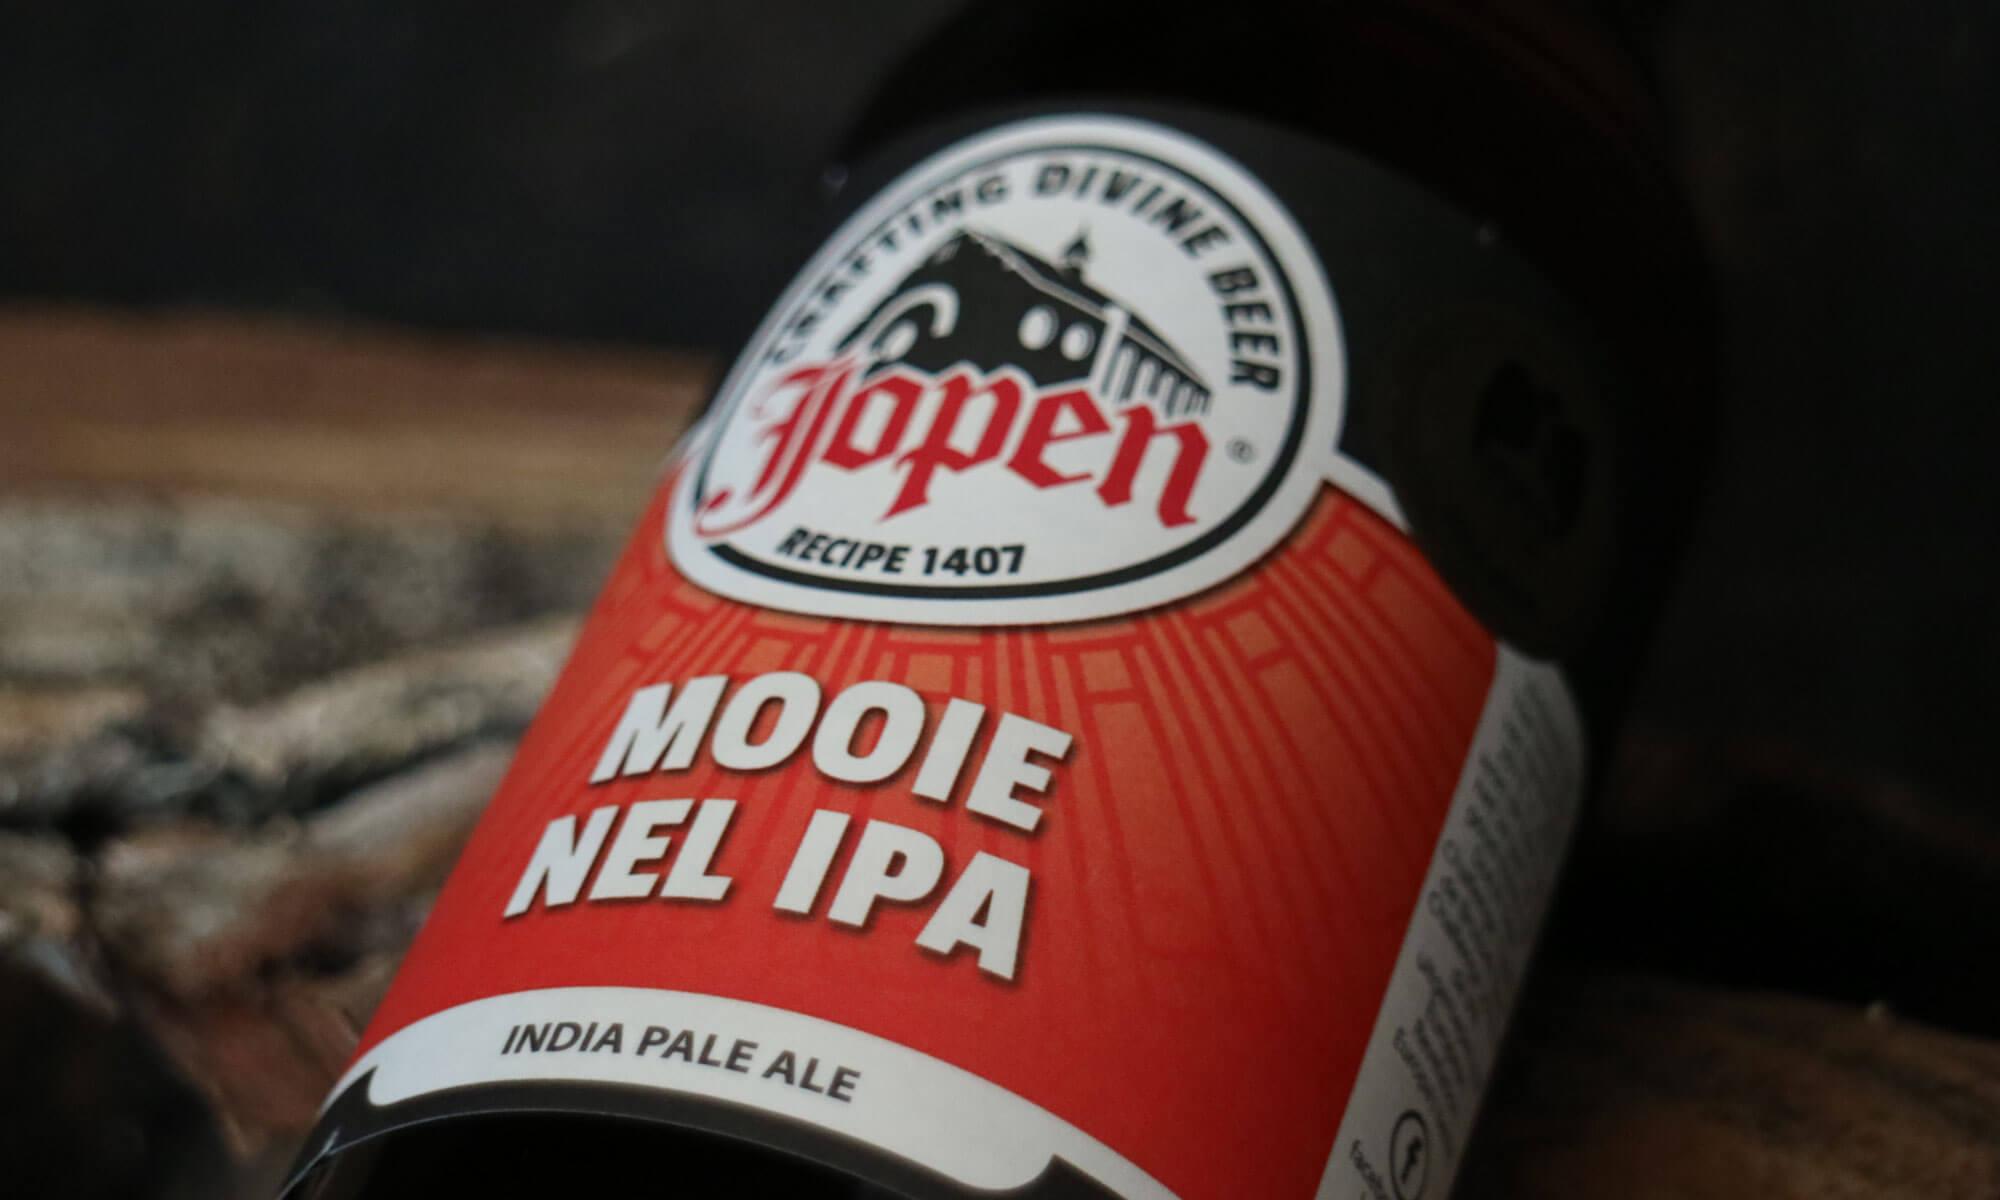 Jopen - Mooie Nel IPA